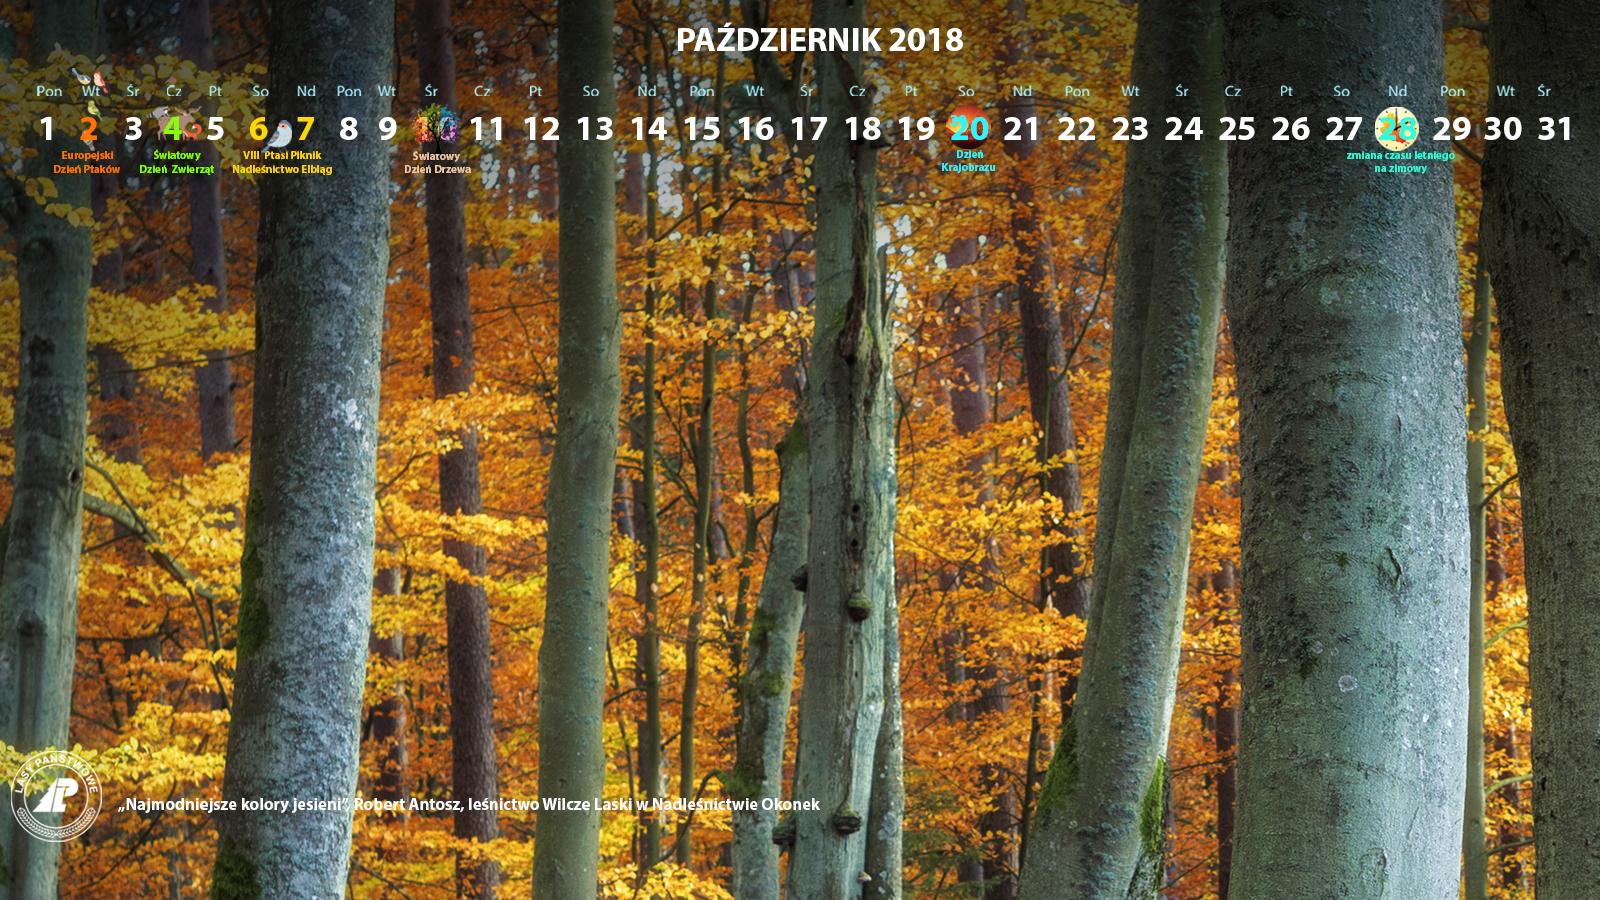 Kalendarz_październik_2018_1600x900[1].jpg